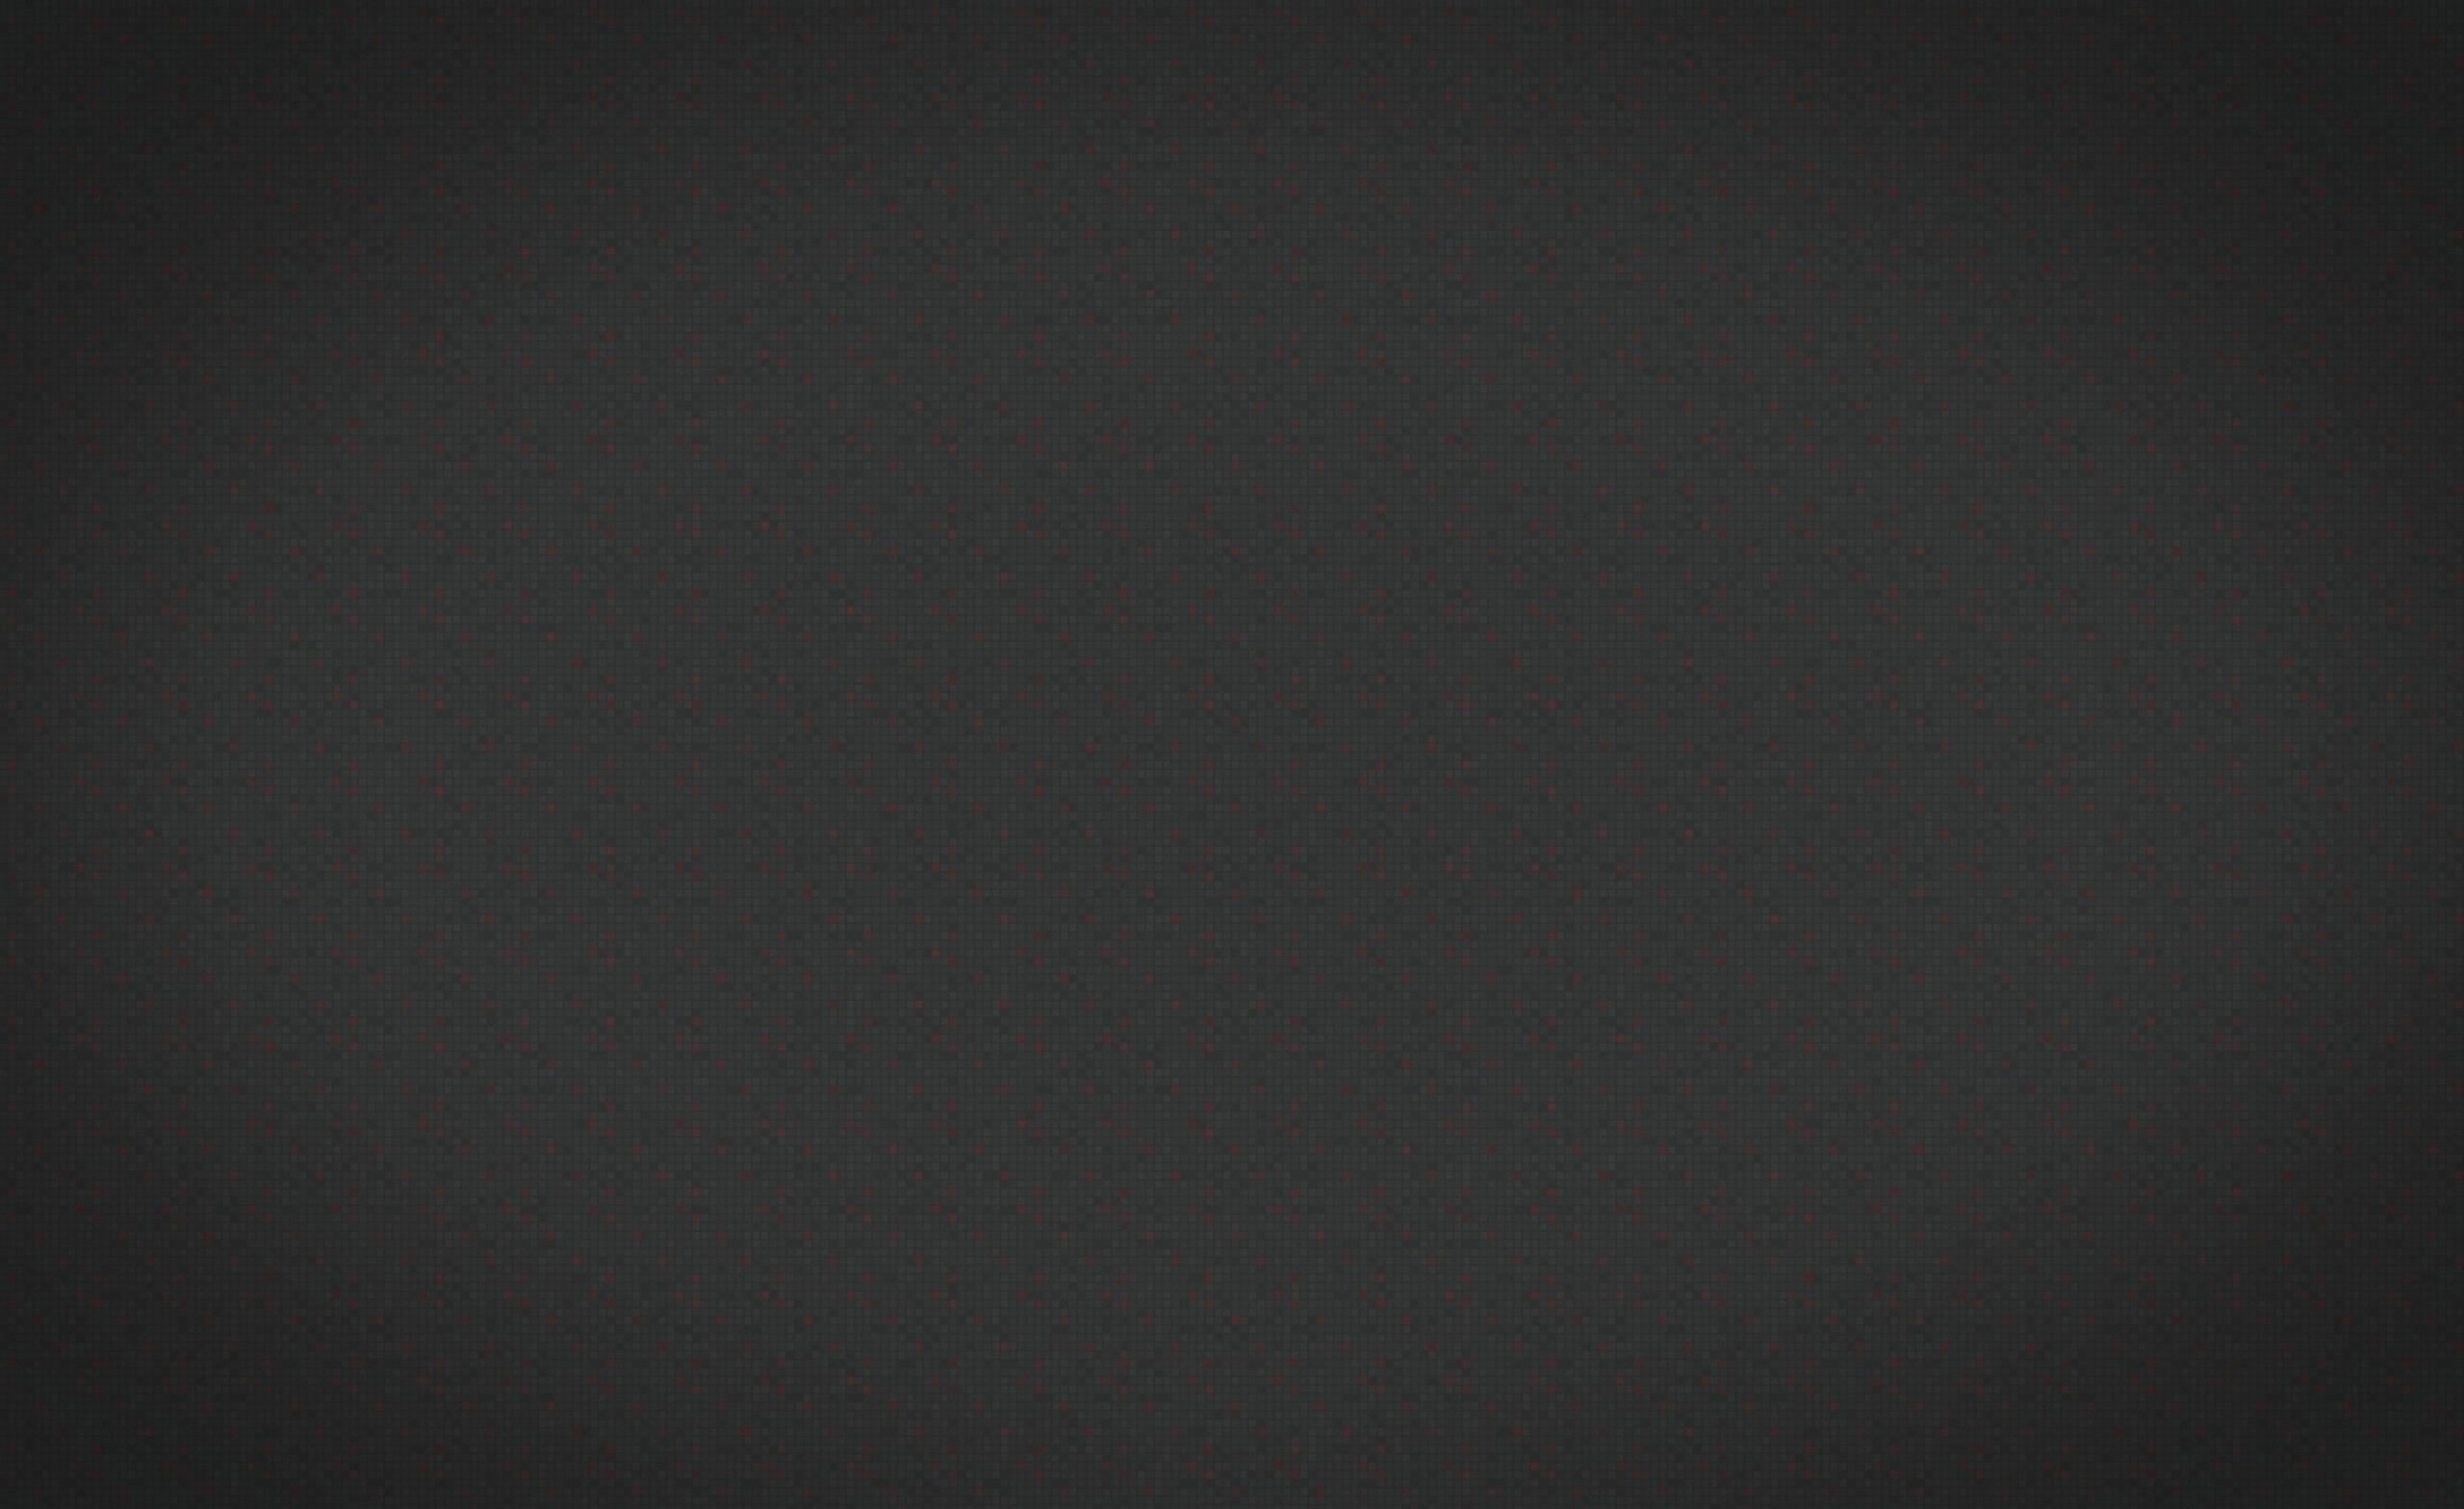 Pixel art pattern gray wallpaper 2560×1600.